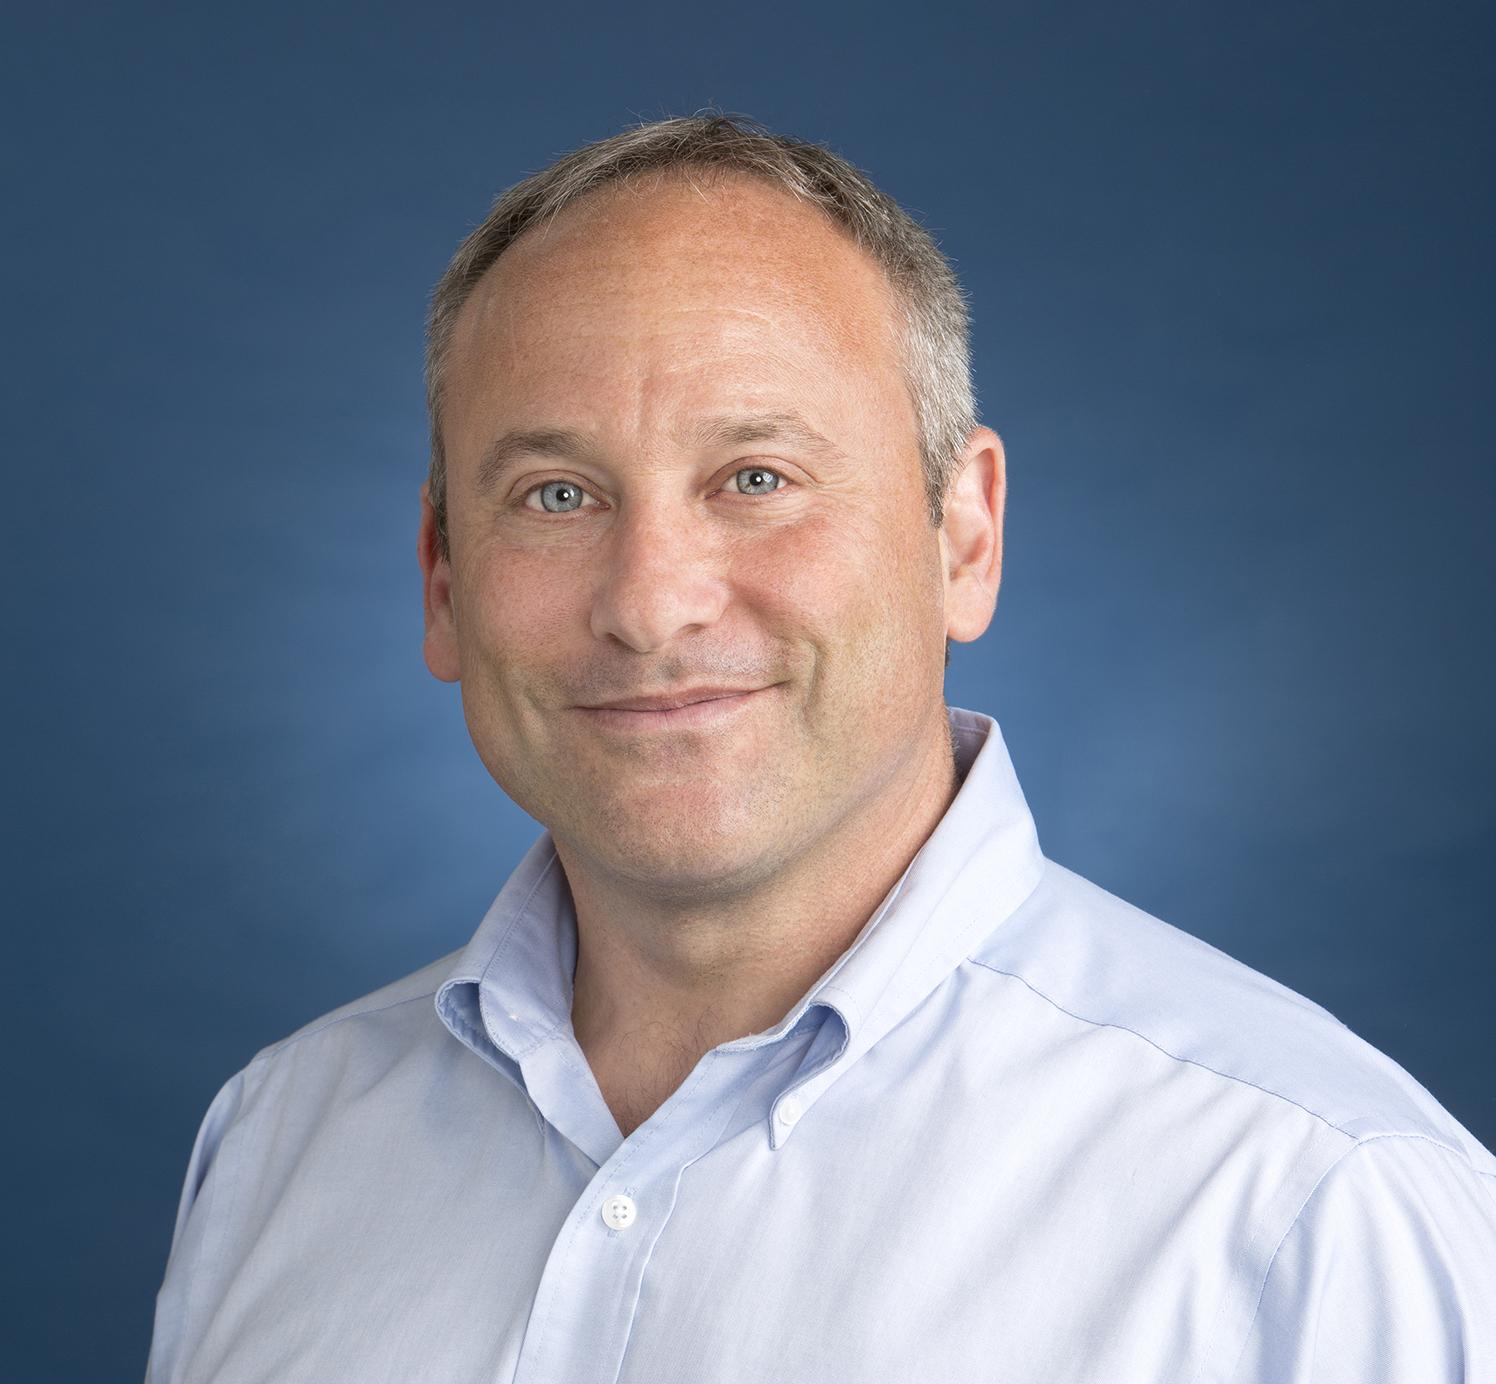 Dr. Steven G. Rogelberg